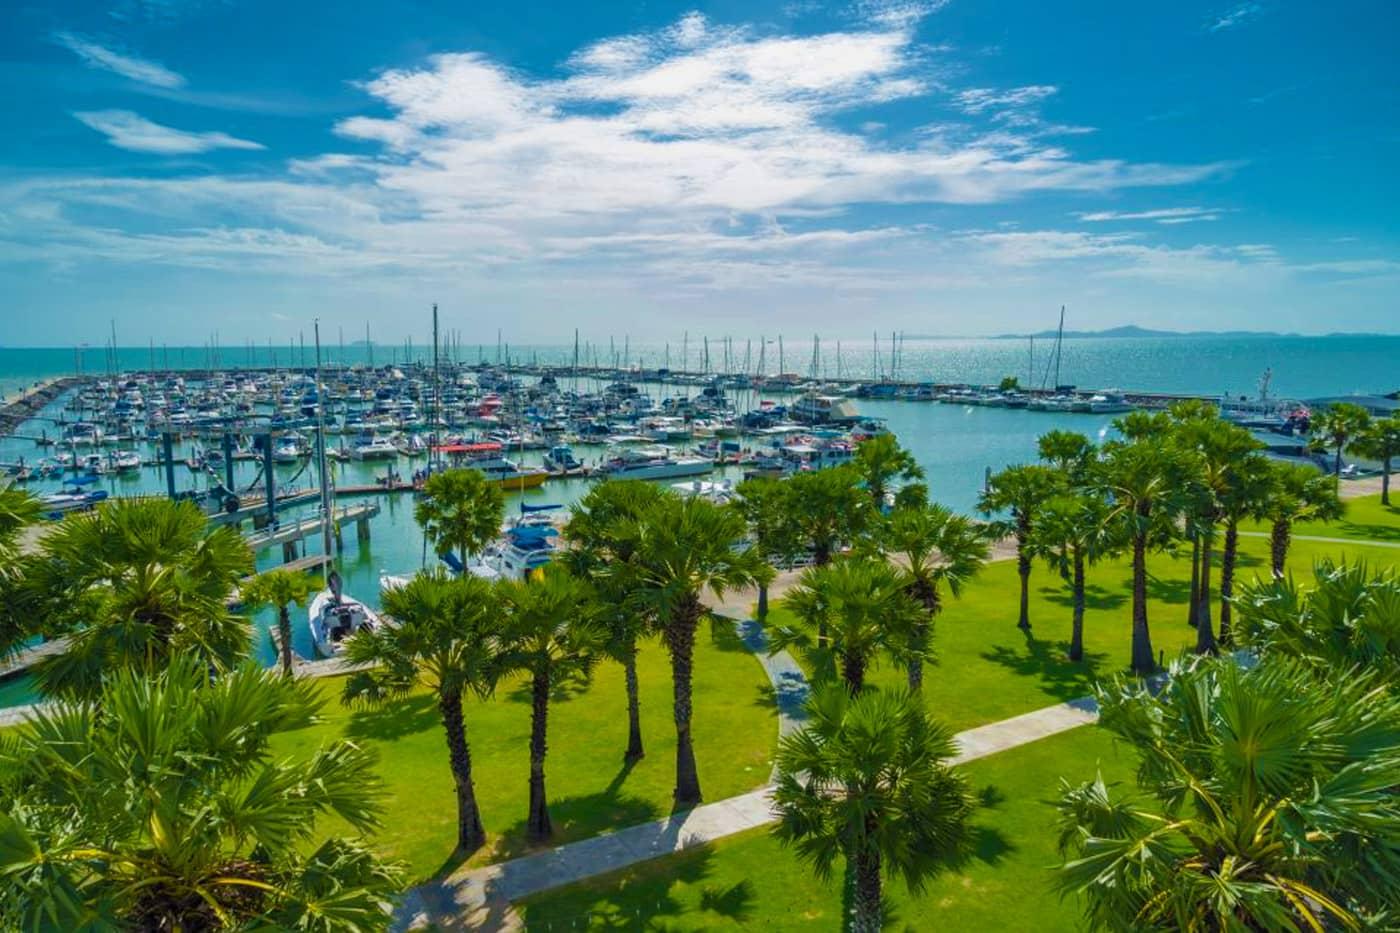 Ocean Marina Boat Show